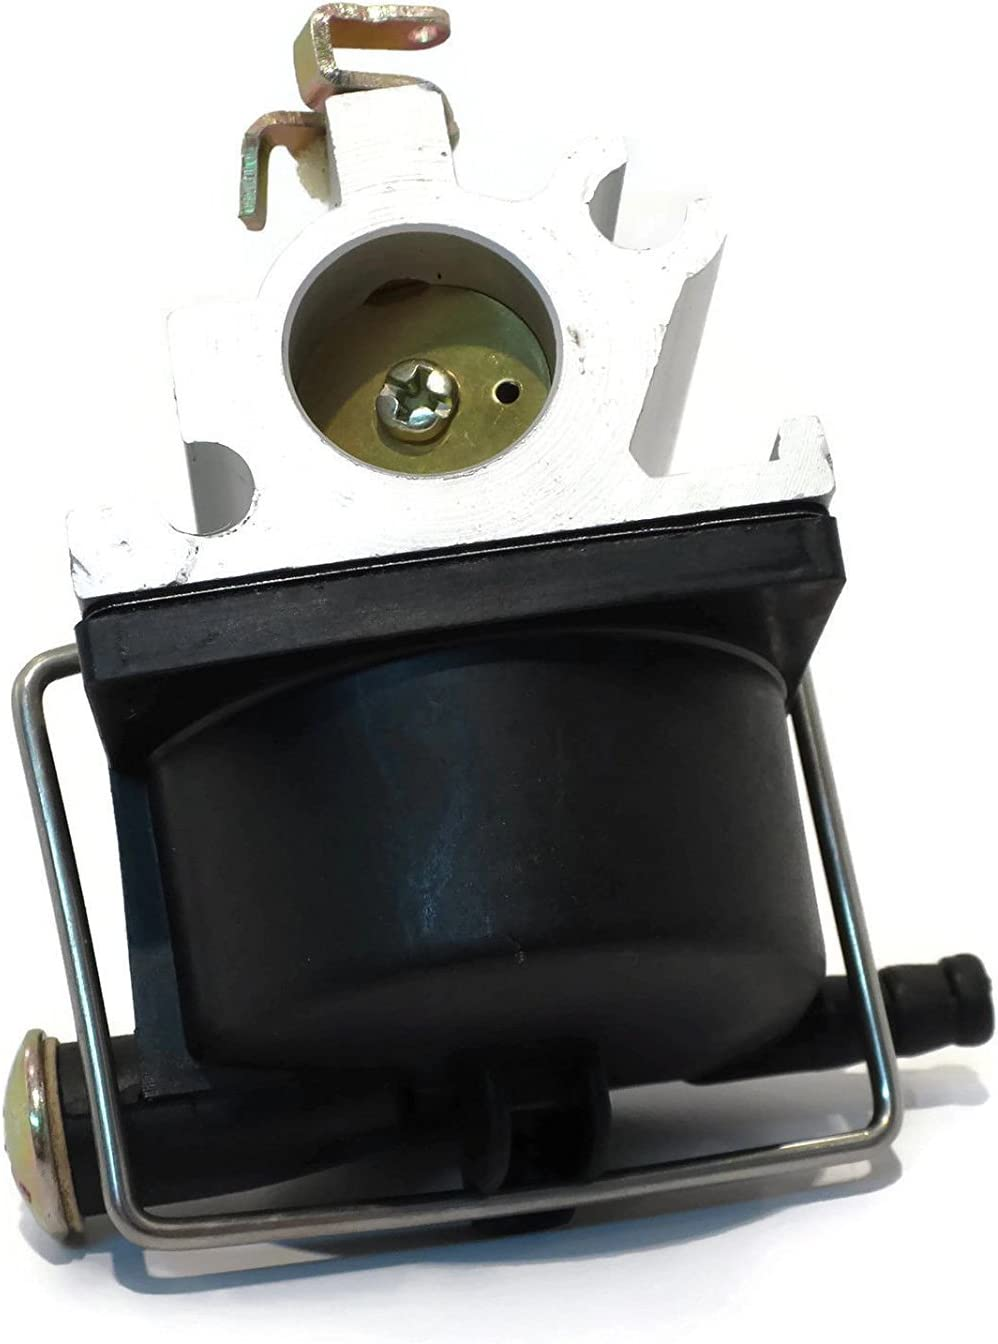 Beehive Carburador con Junta para Motores Tecumseh 632671 632671C VLV40 VLV50 VLV55 VLV60 VLV126